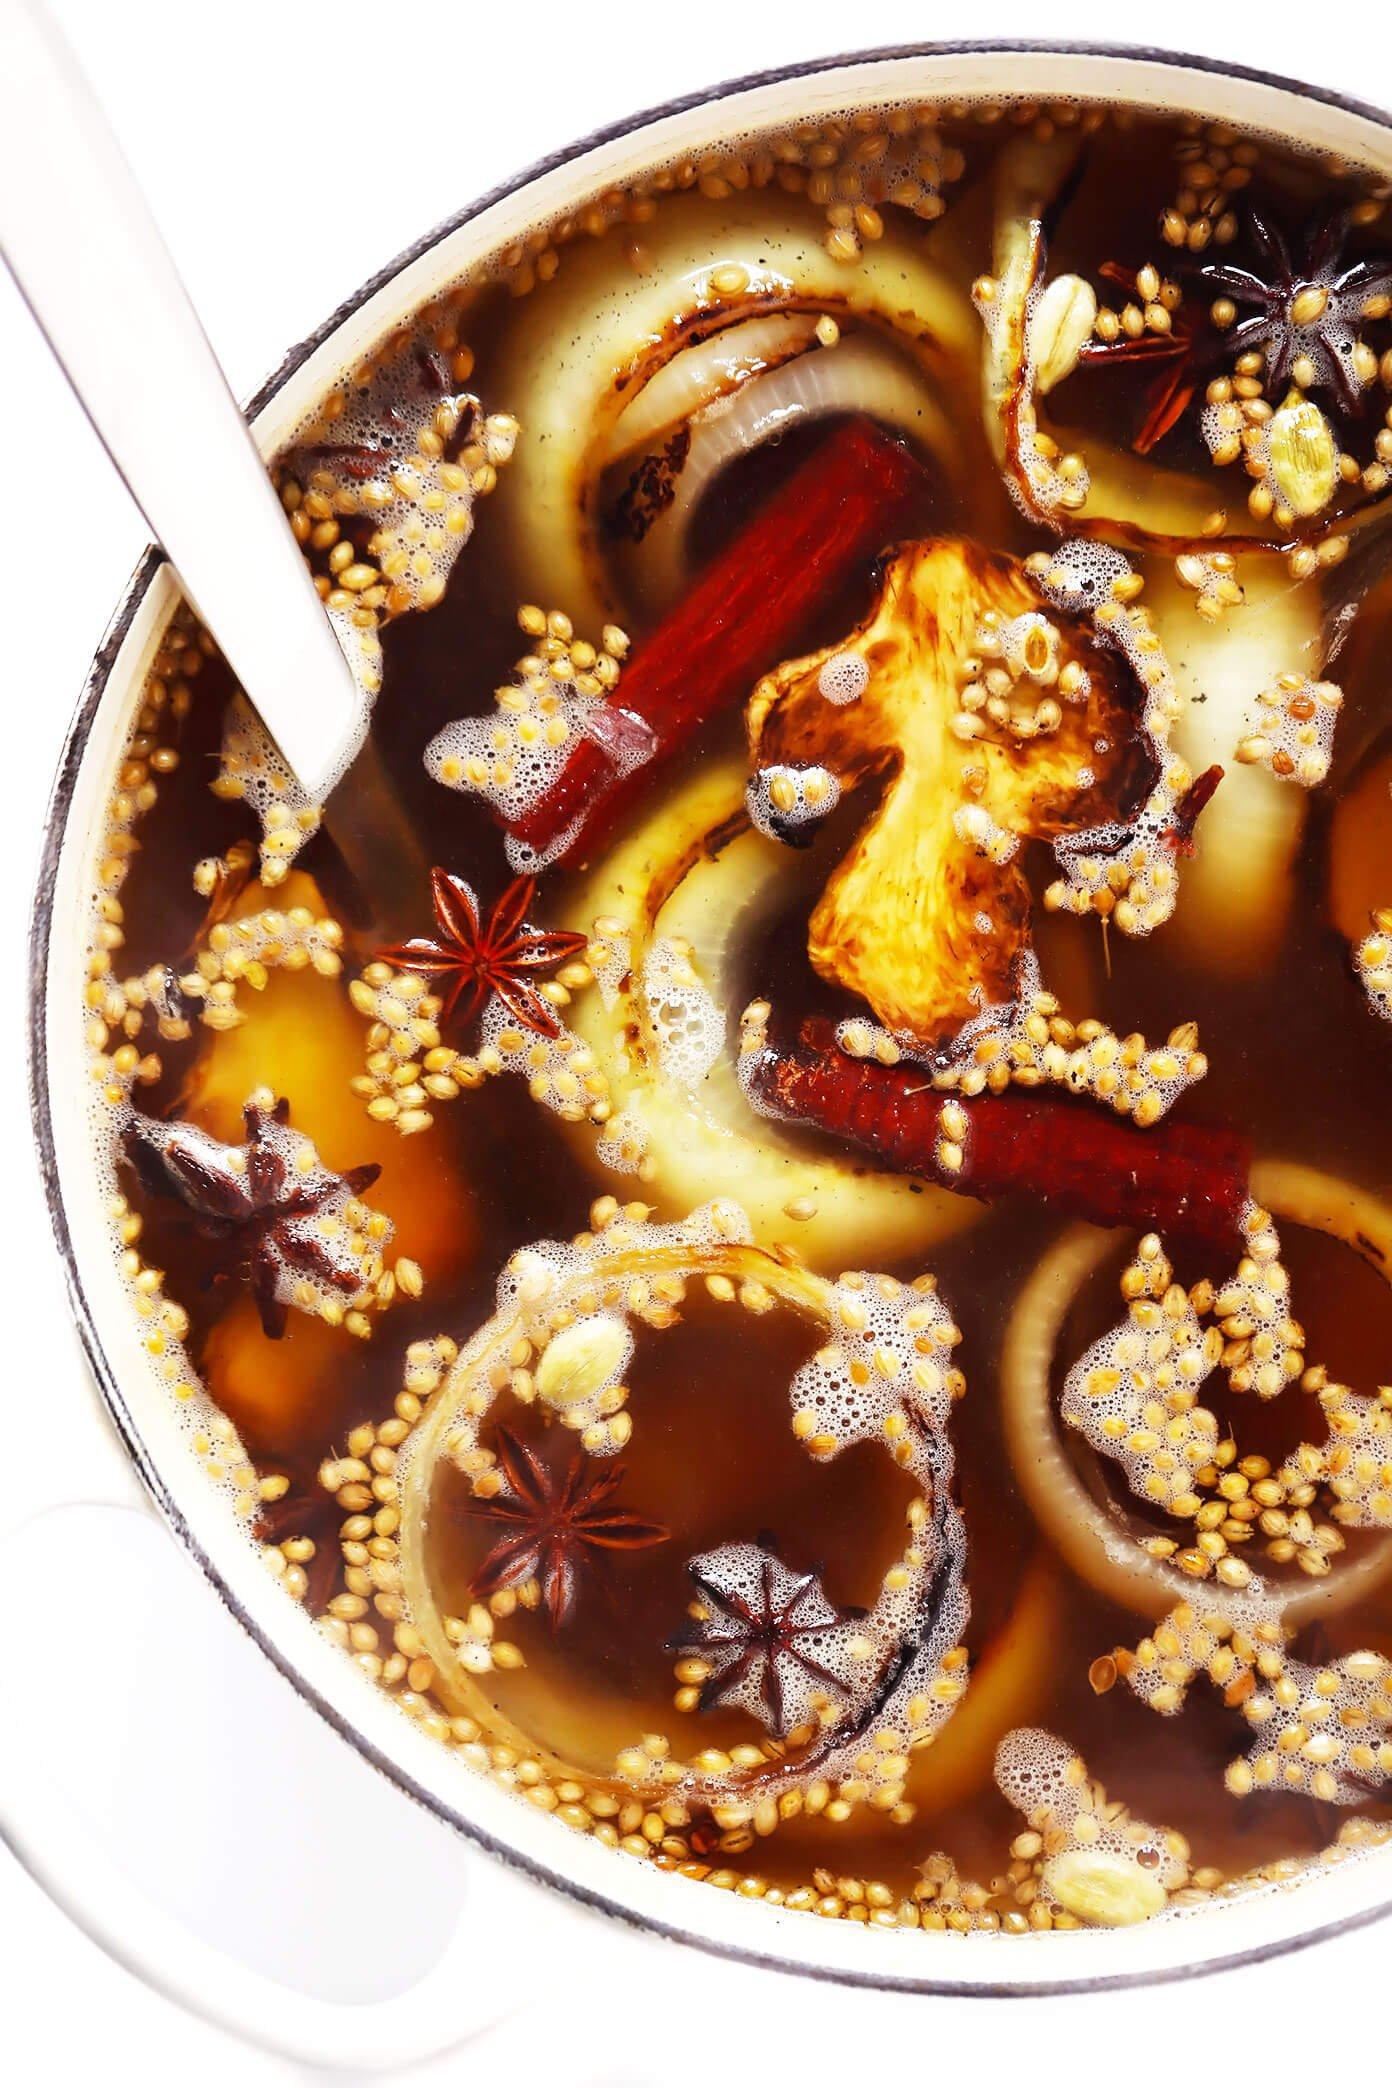 How To Make Pho Soup